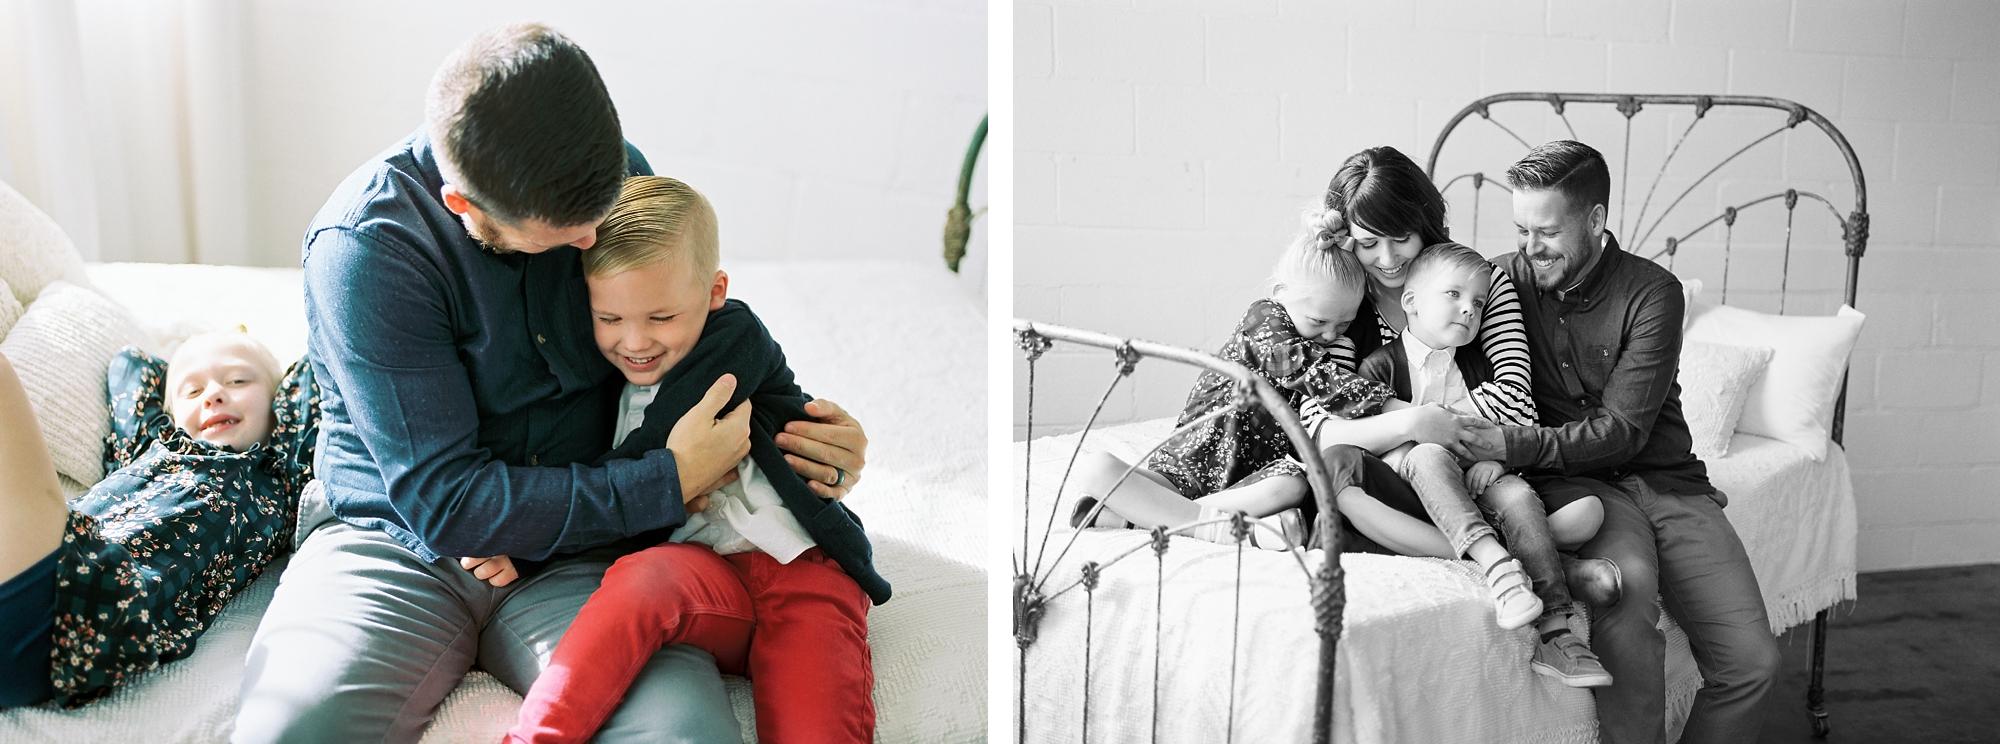 raeganchristensenphotographyfamilies